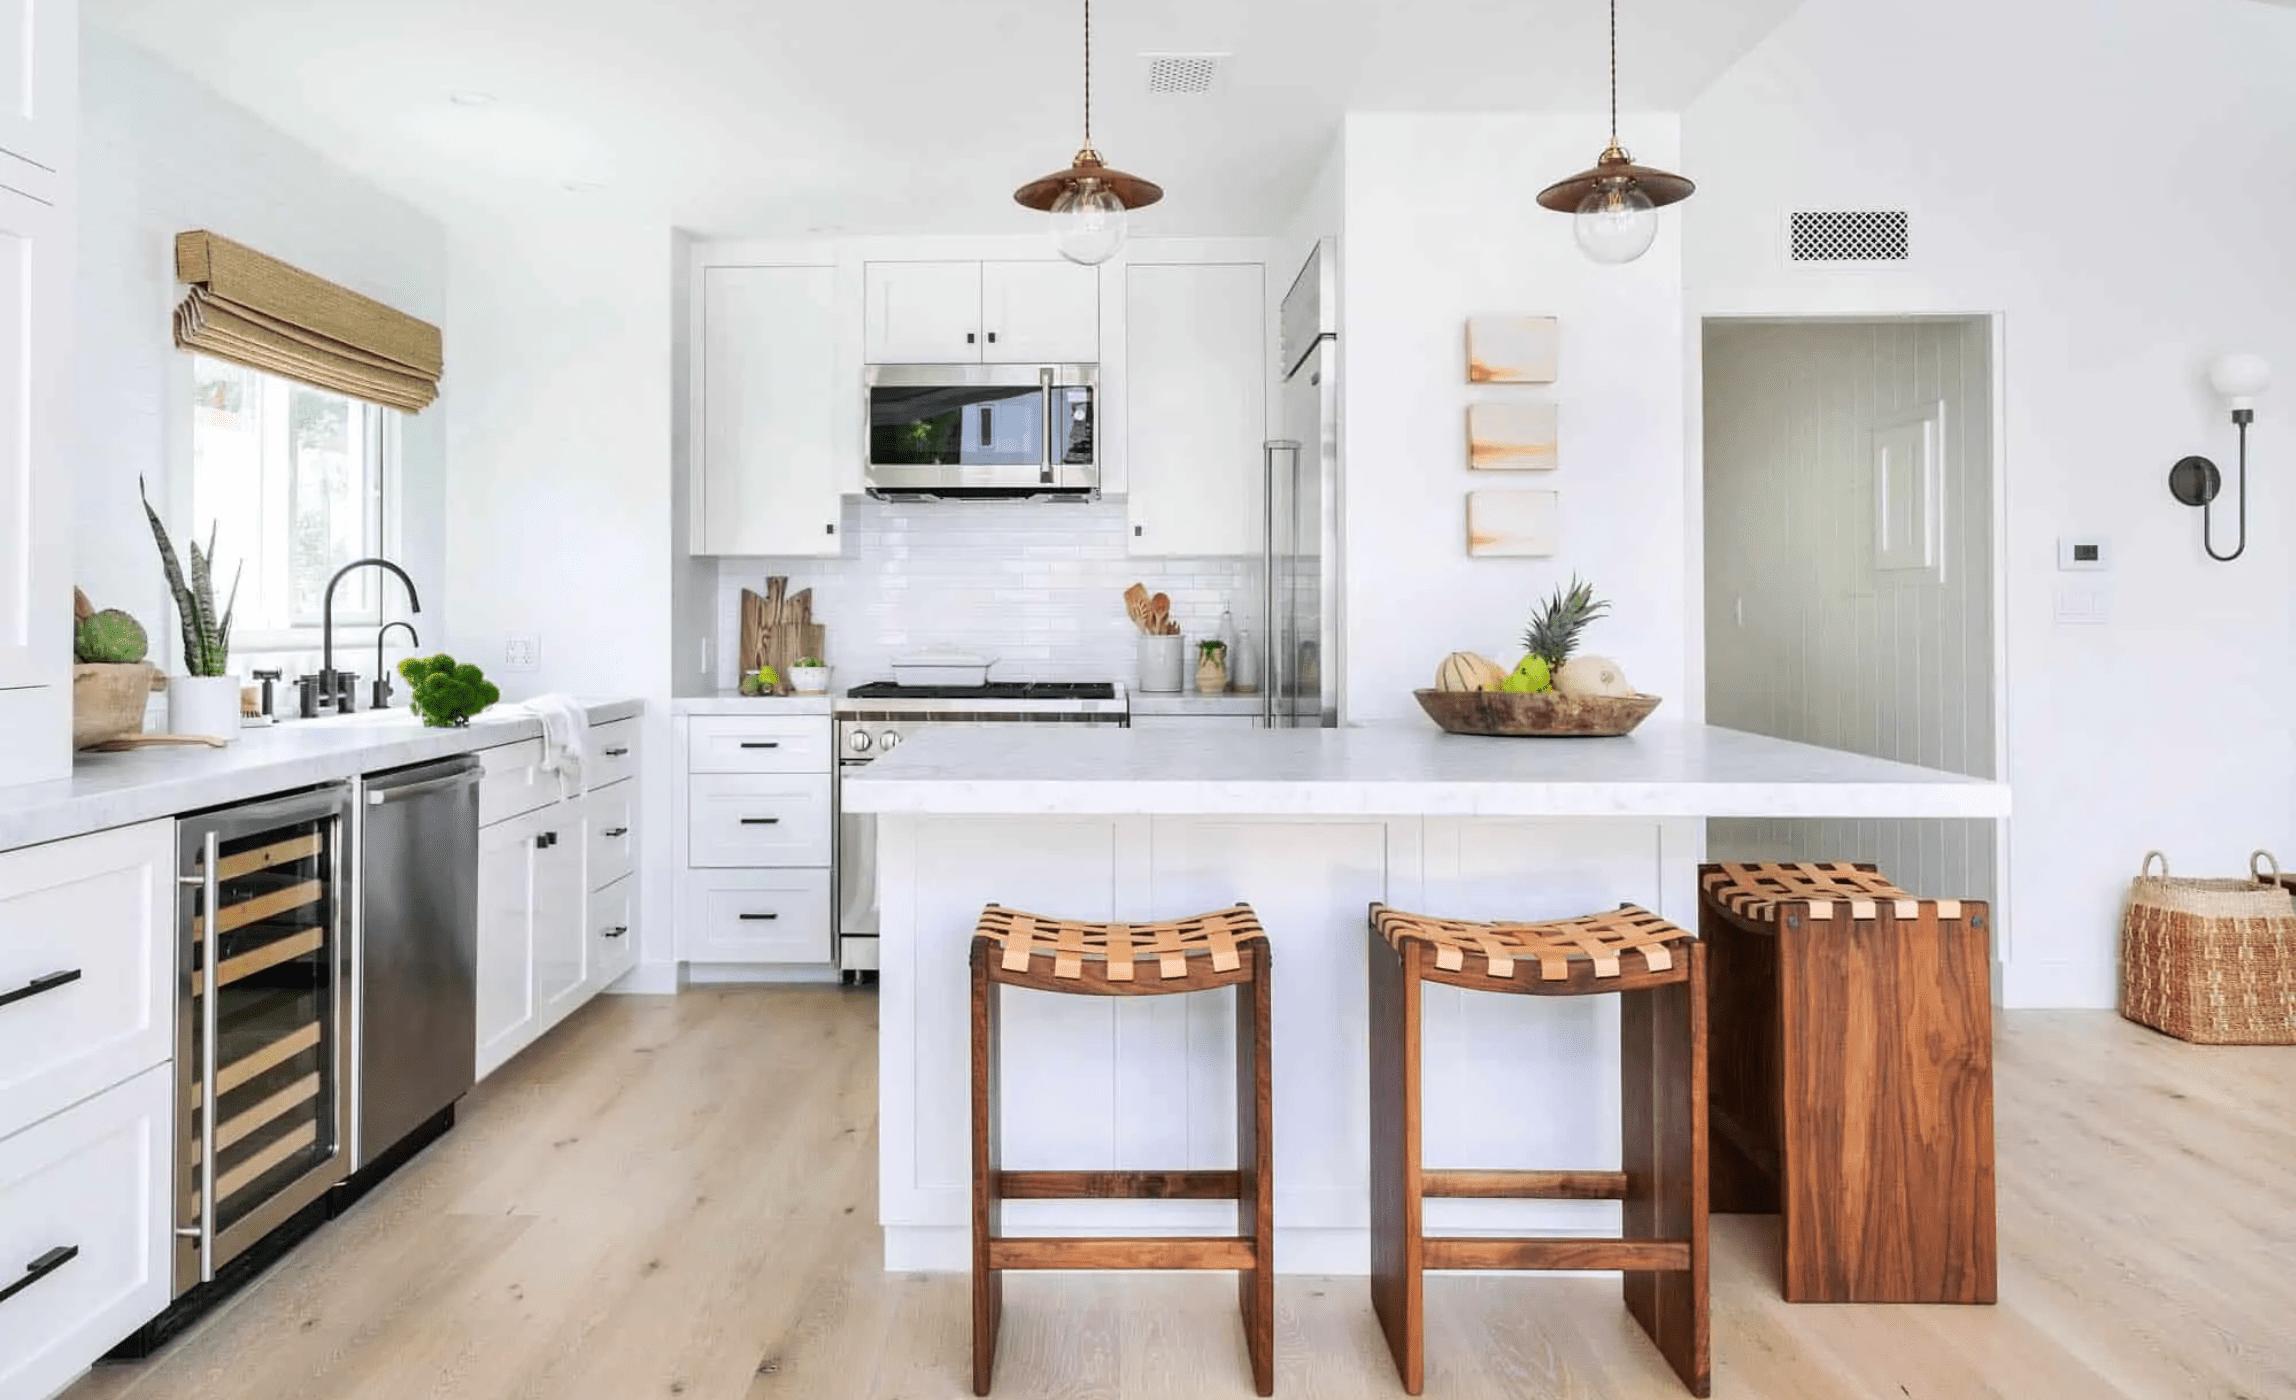 An open-concept kitchen with a corner bar